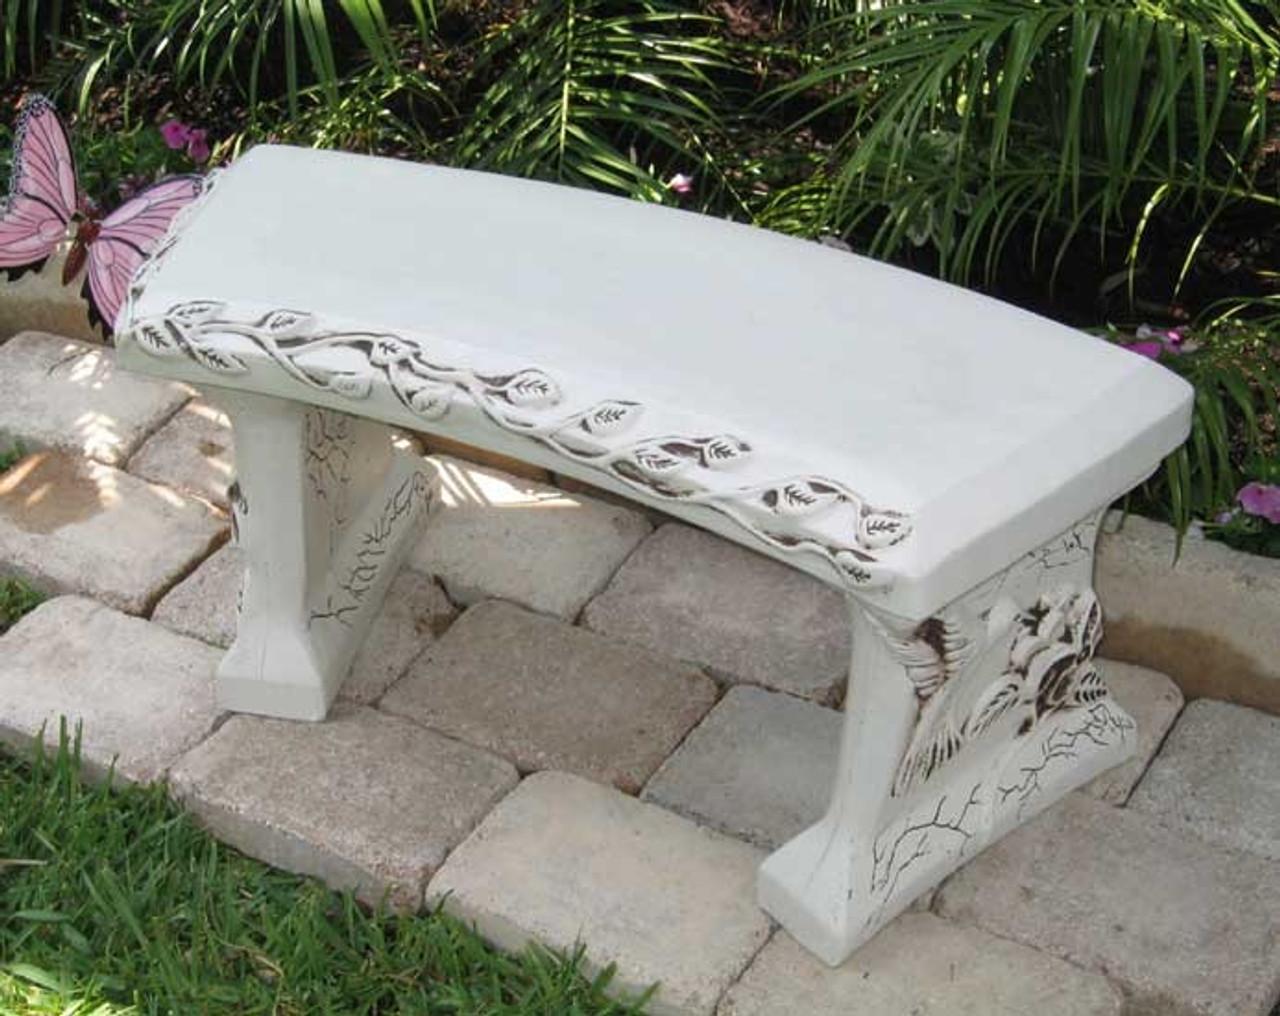 Admirable Personalized Concrete Garden Bench Inzonedesignstudio Interior Chair Design Inzonedesignstudiocom